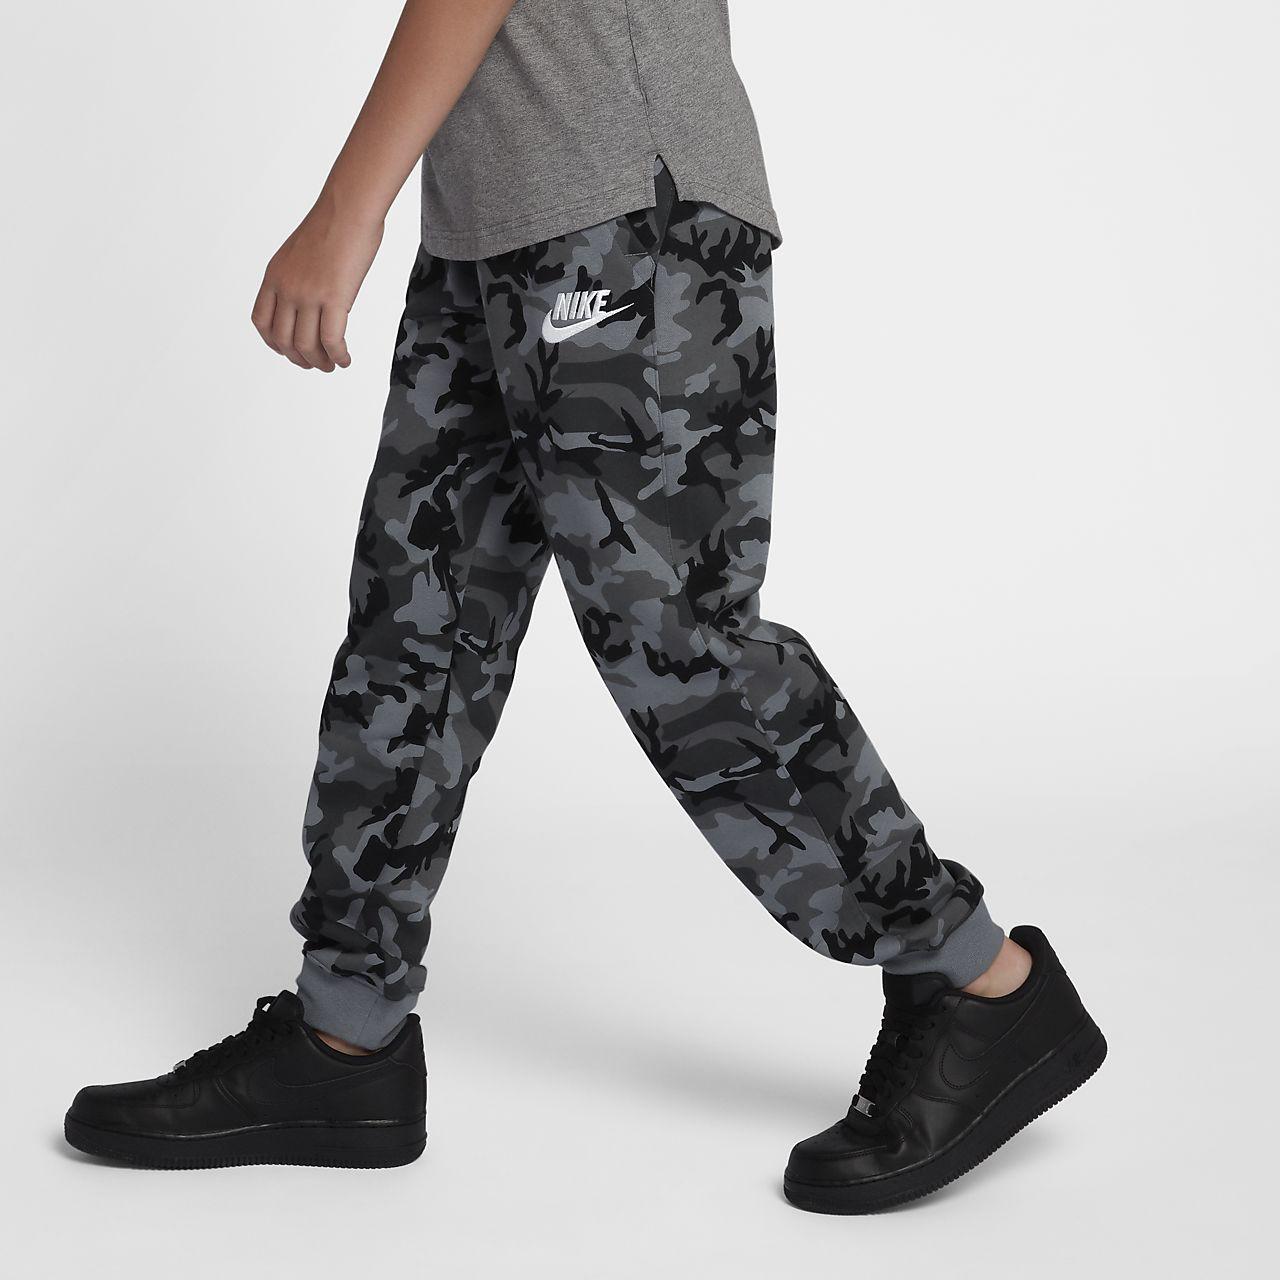 67496cdca17 ... Εμπριμέ παντελόνι φόρμας Nike Sportswear Club Fleece για μεγάλα αγόρια